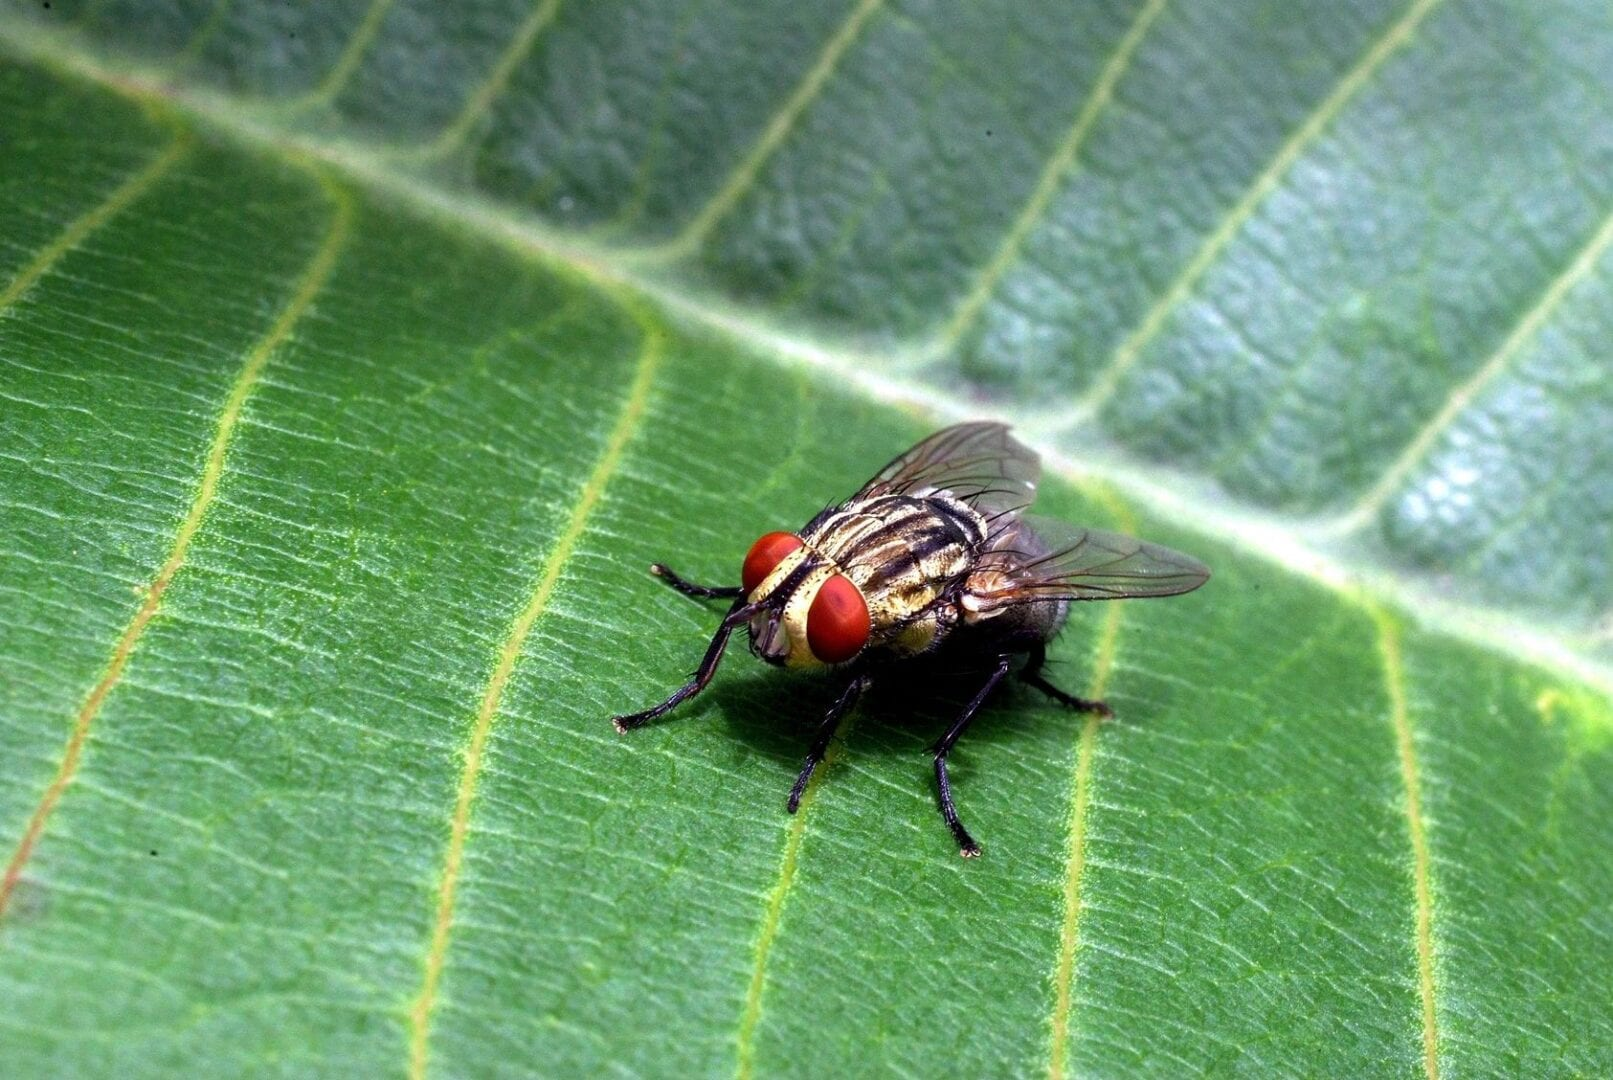 Newman Pest Control